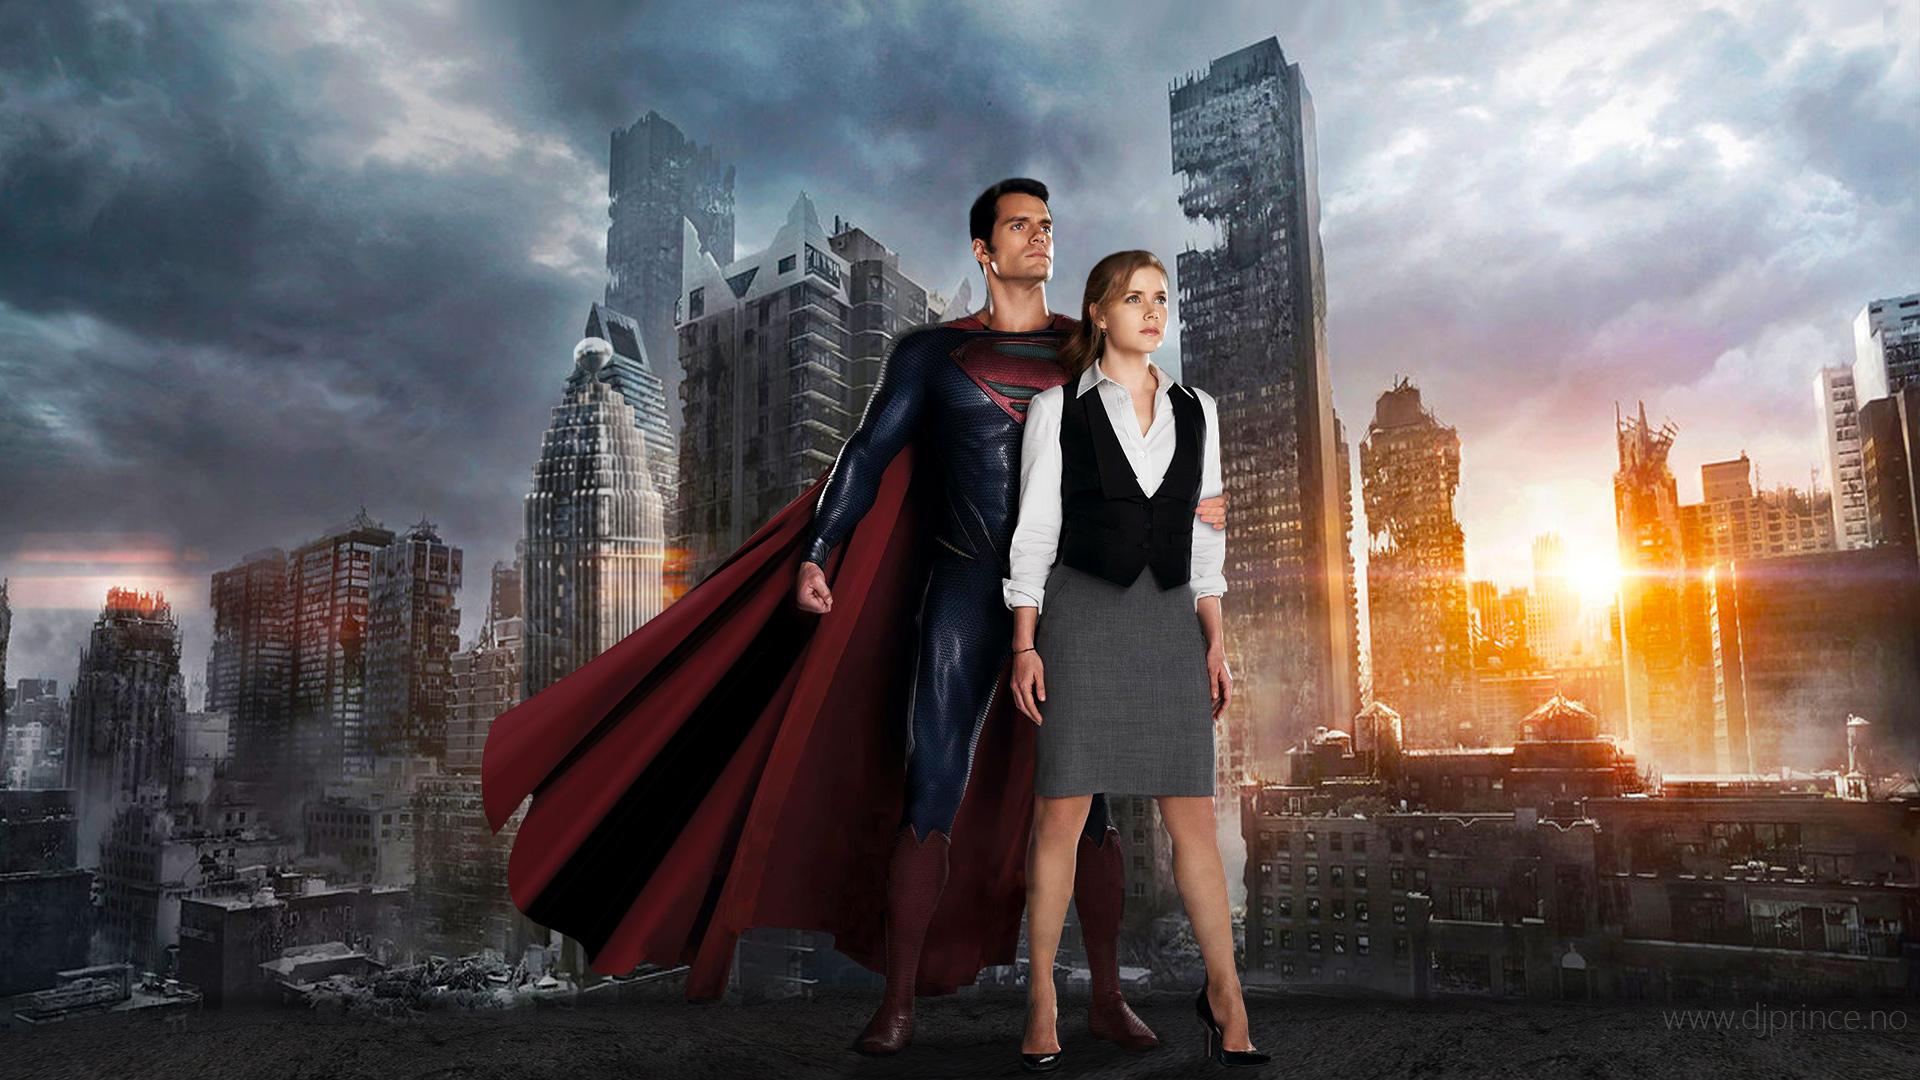 Superman Man of Steel wallpaper 11